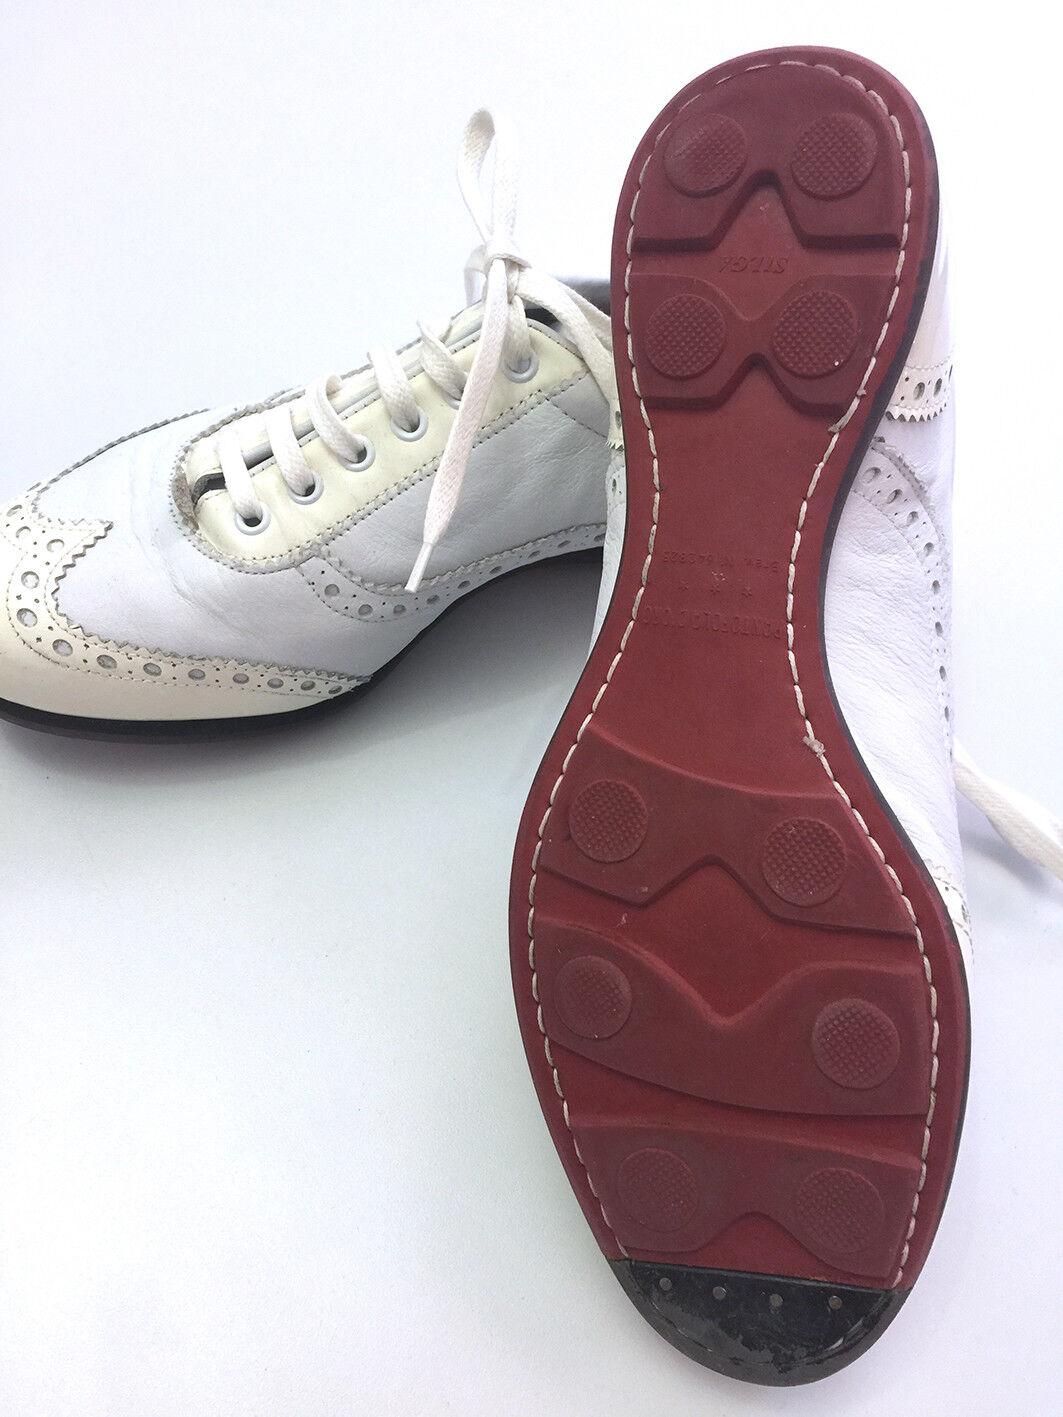 Pantofola D 'Oro Designer Scarpe, Sneaker, Pelle, Bianco, Tg. 41